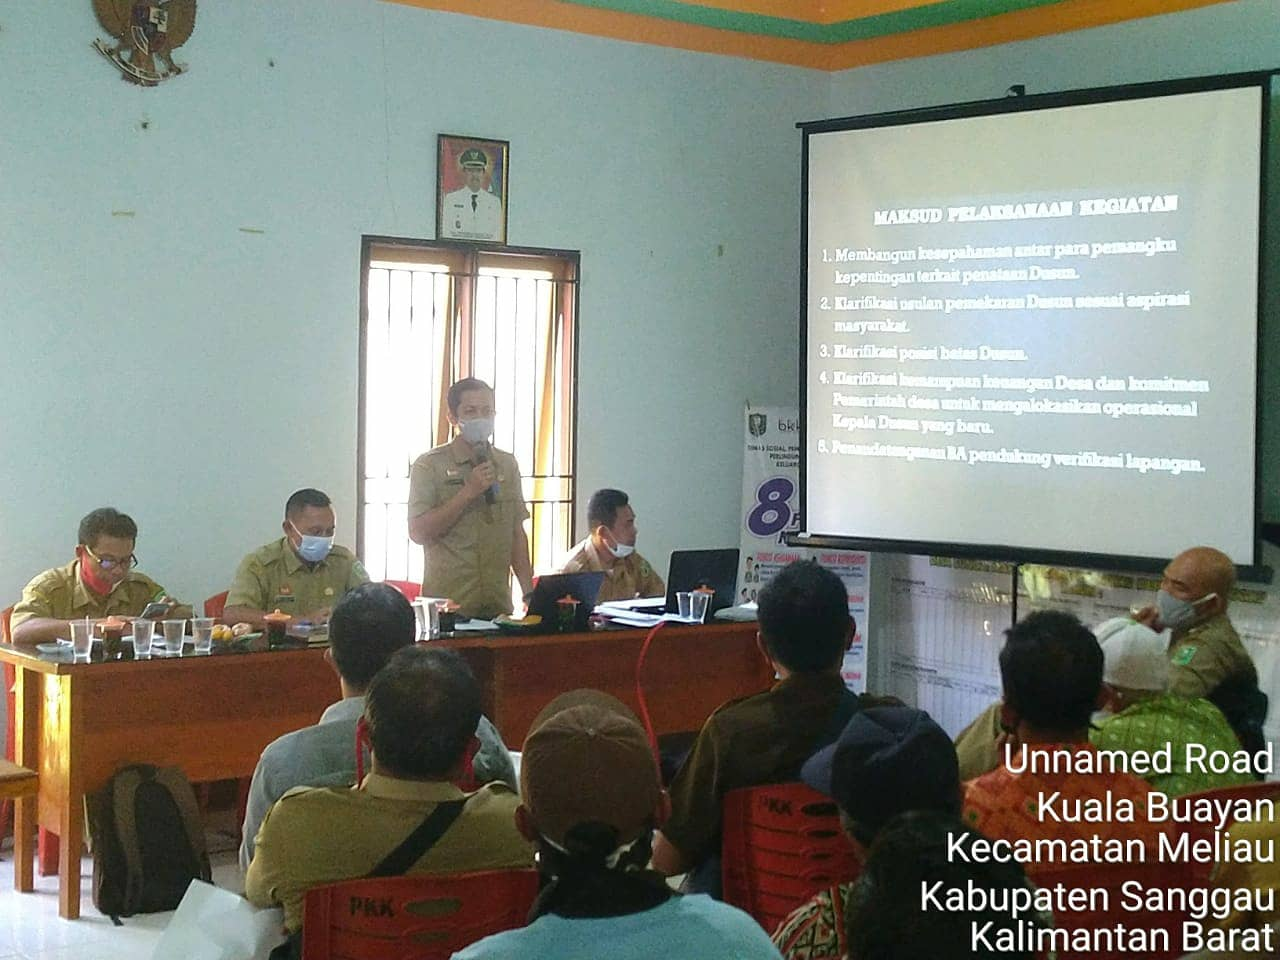 DPM Pemdes Kabupaten Sanggau Melakukan Verifikasi Lapangan Usulan Pemekaran Dusun 5 Desa di Kecamatan Meliau